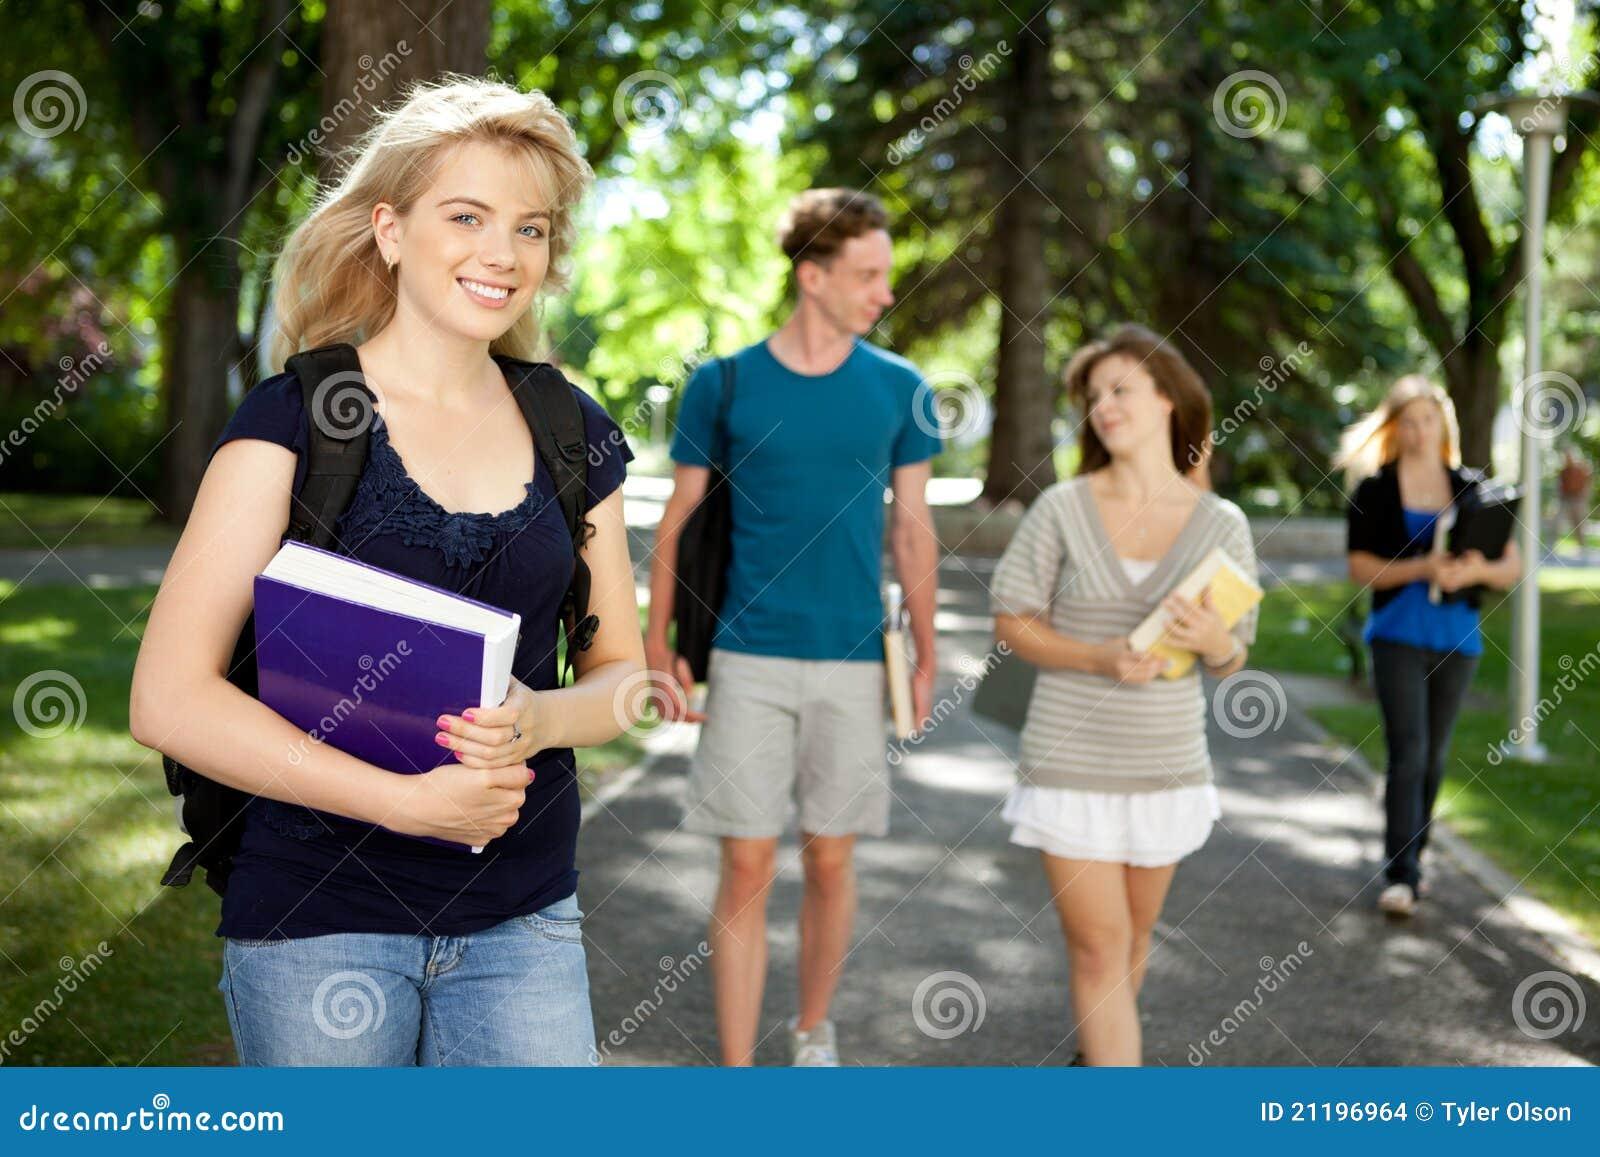 College Girl Portrait